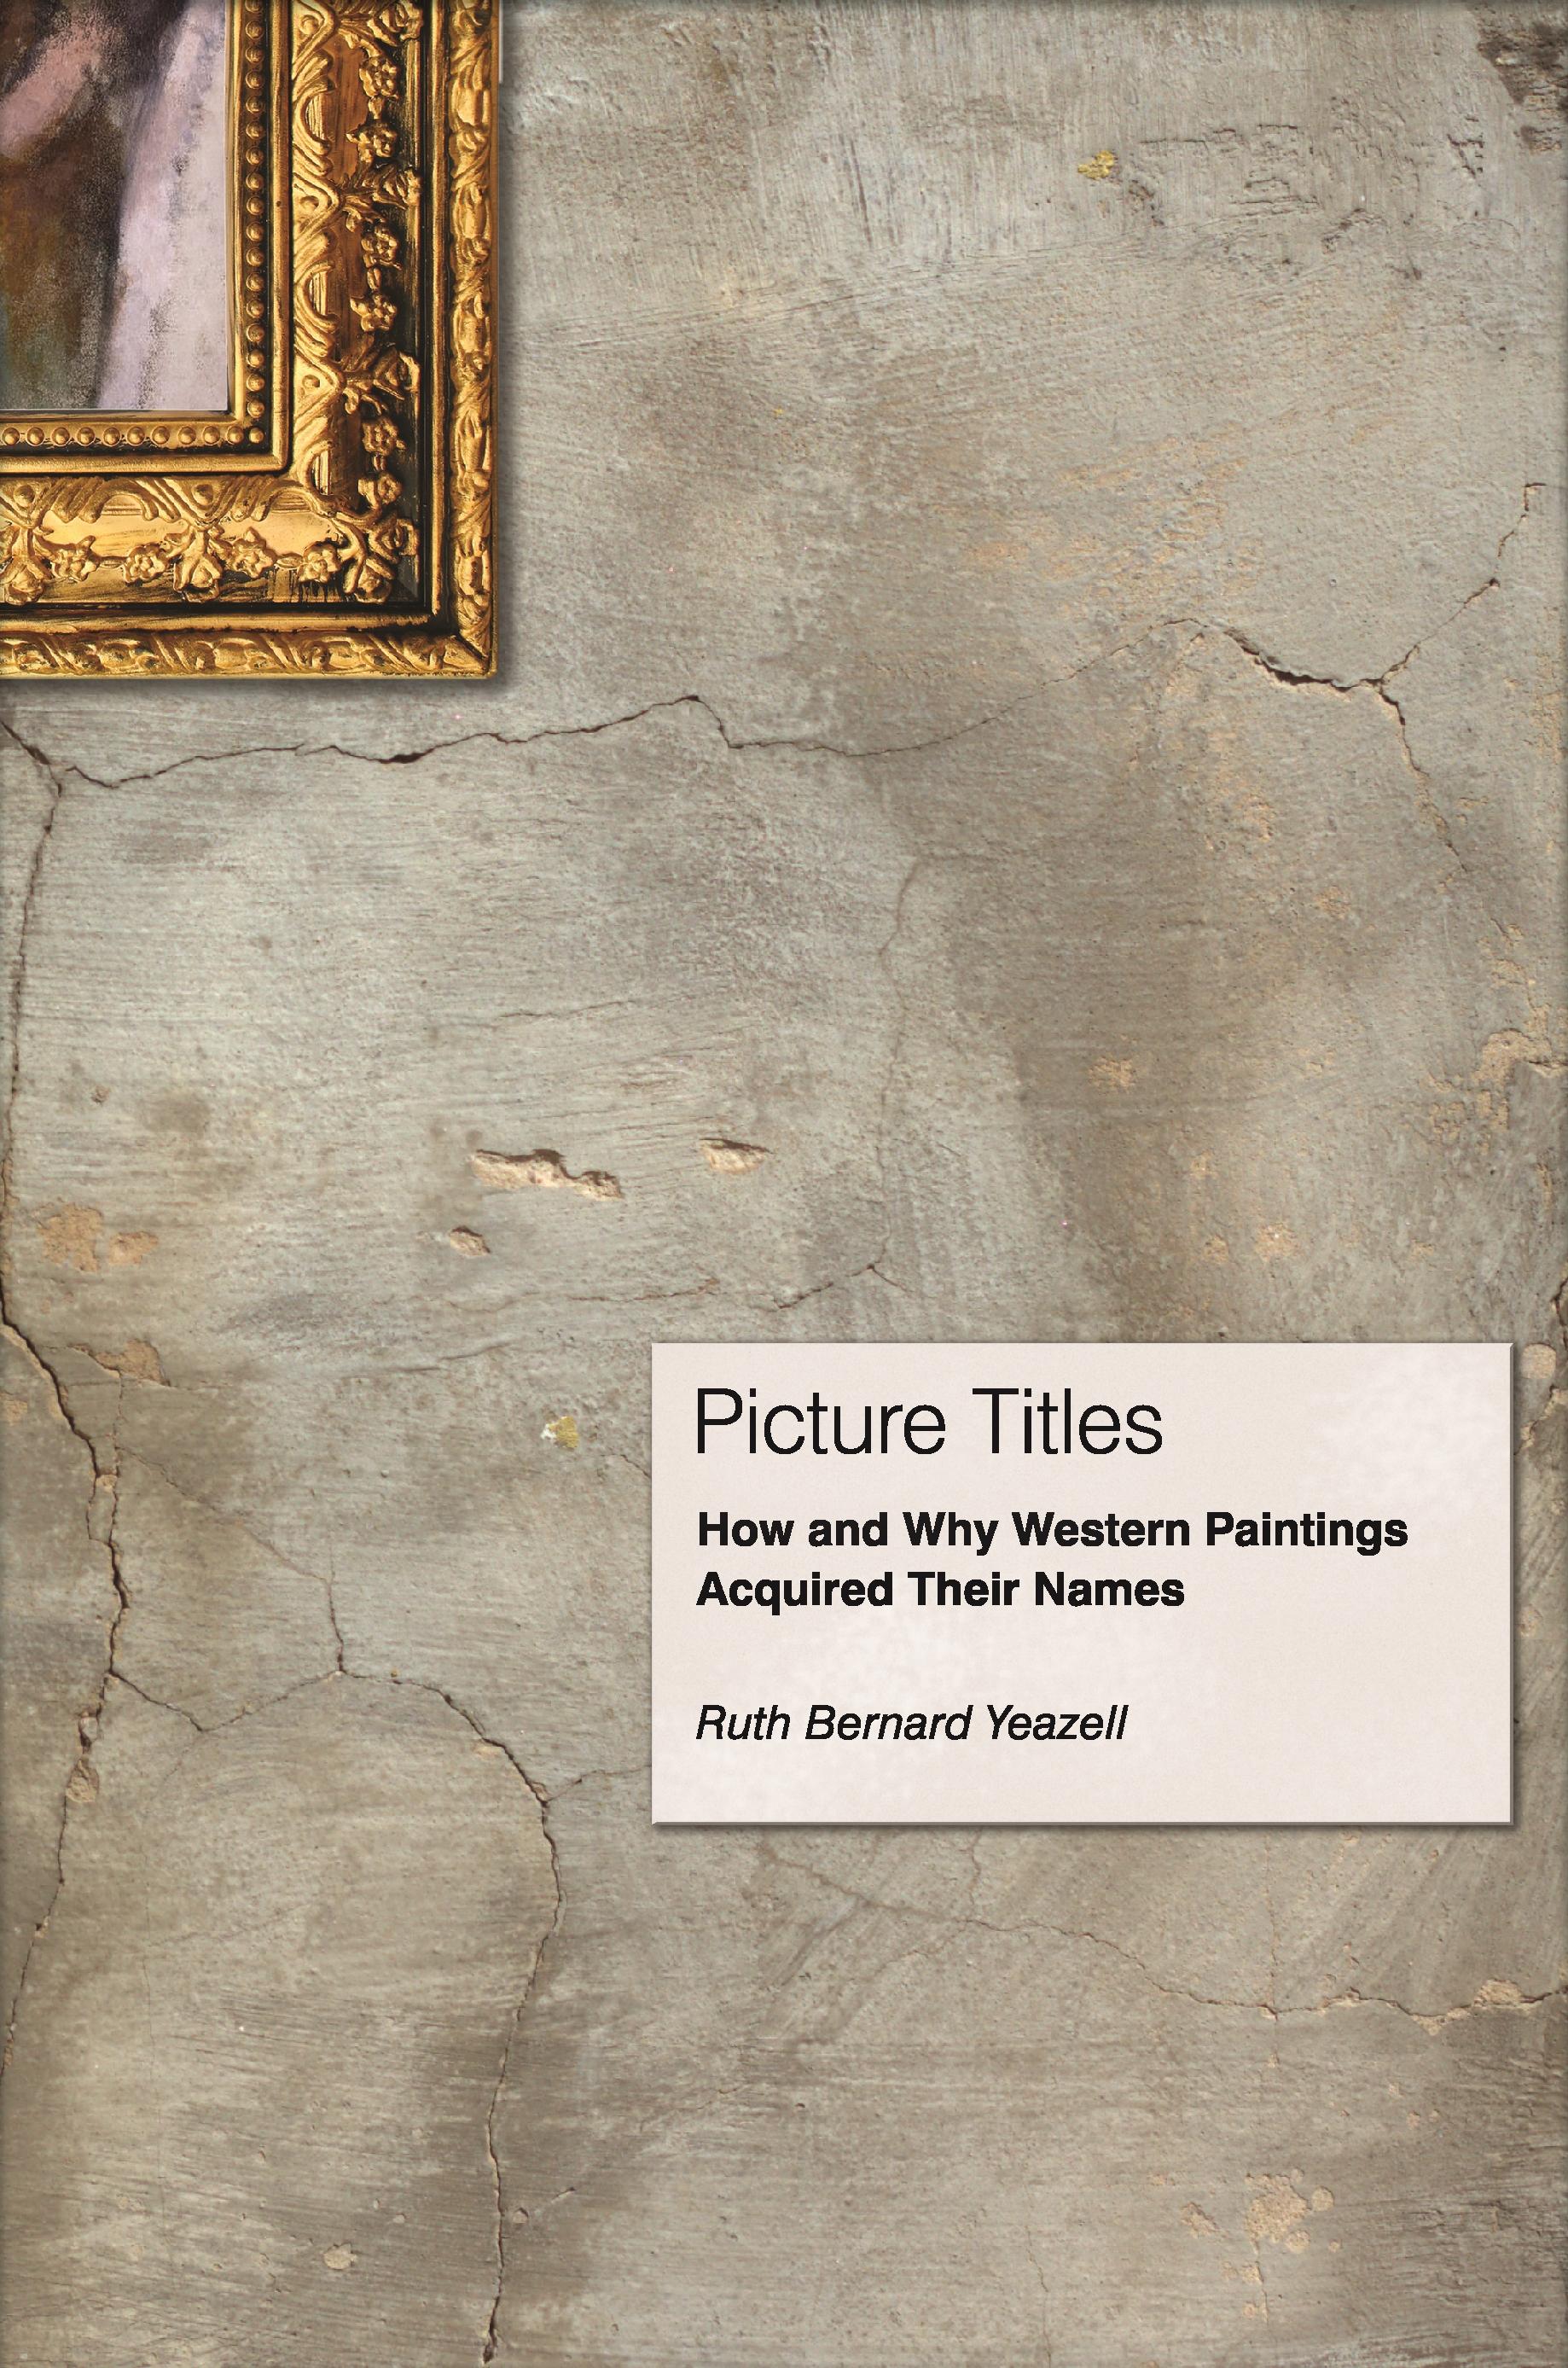 Painting Titles : painting, titles, Picture, Titles, Princeton, University, Press